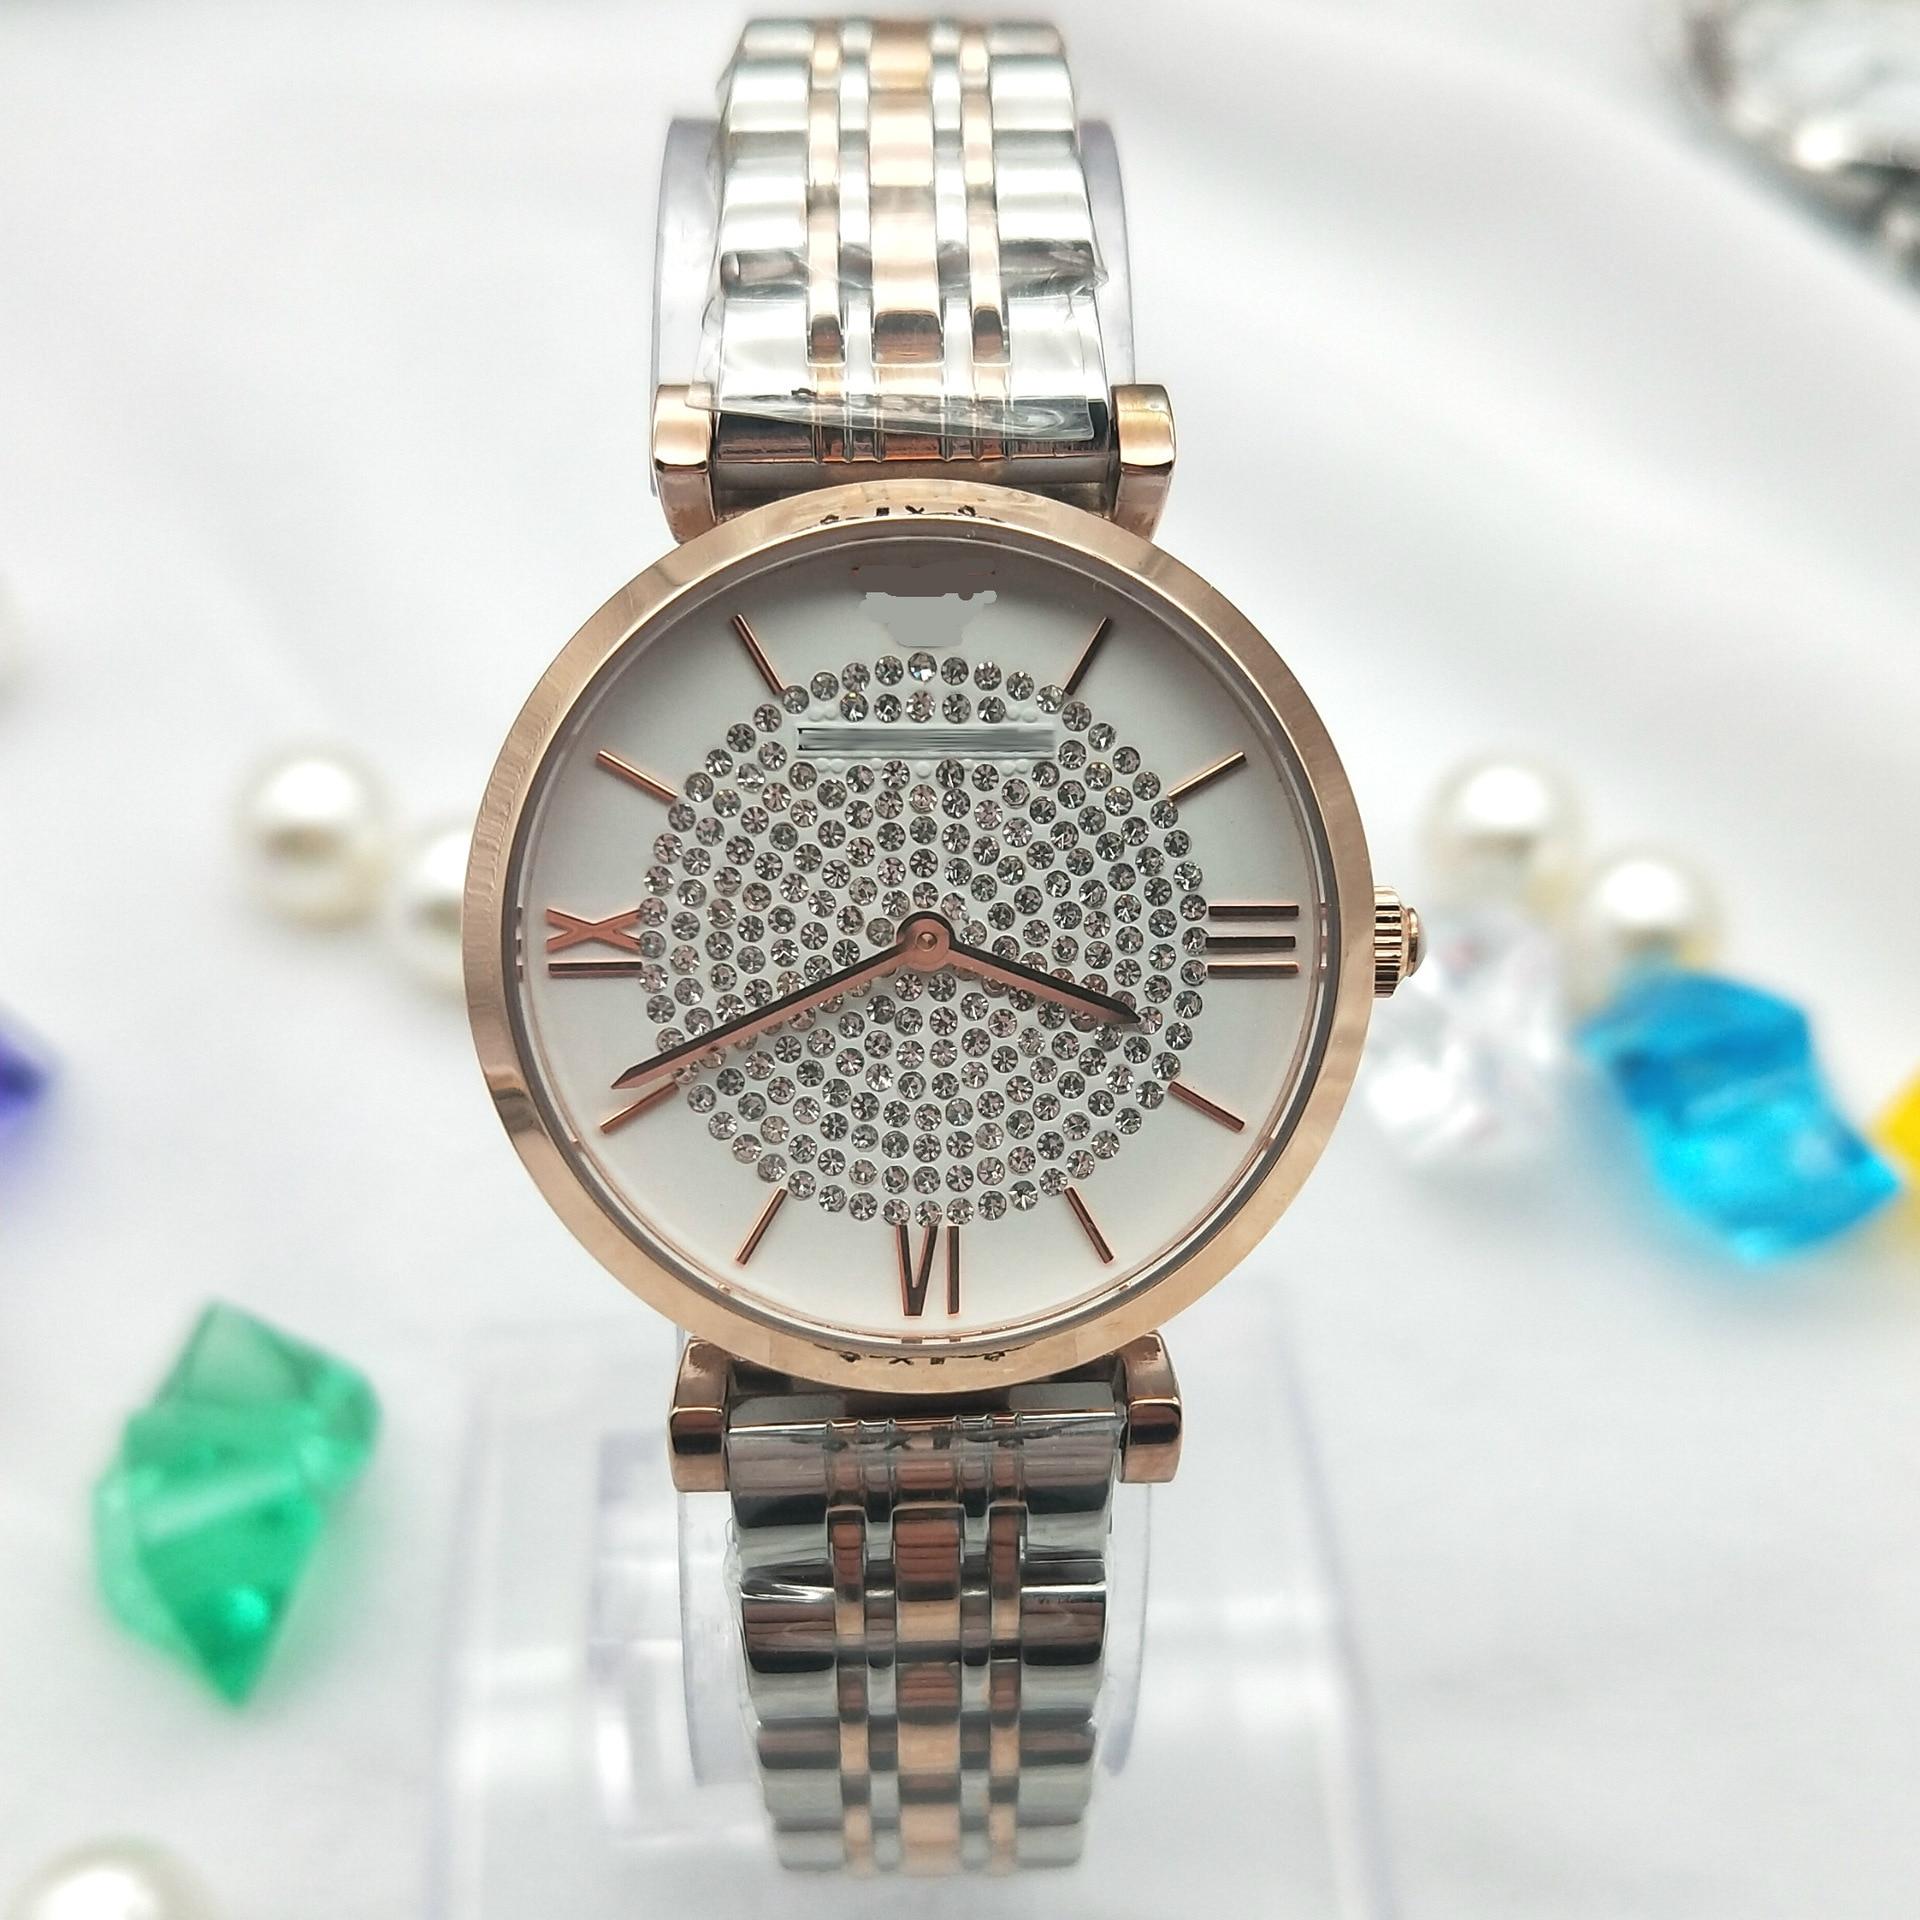 New stylish star-studded diamond watch high-grade waterproof ladies original quartz watchNew stylish star-studded diamond watch high-grade waterproof ladies original quartz watch